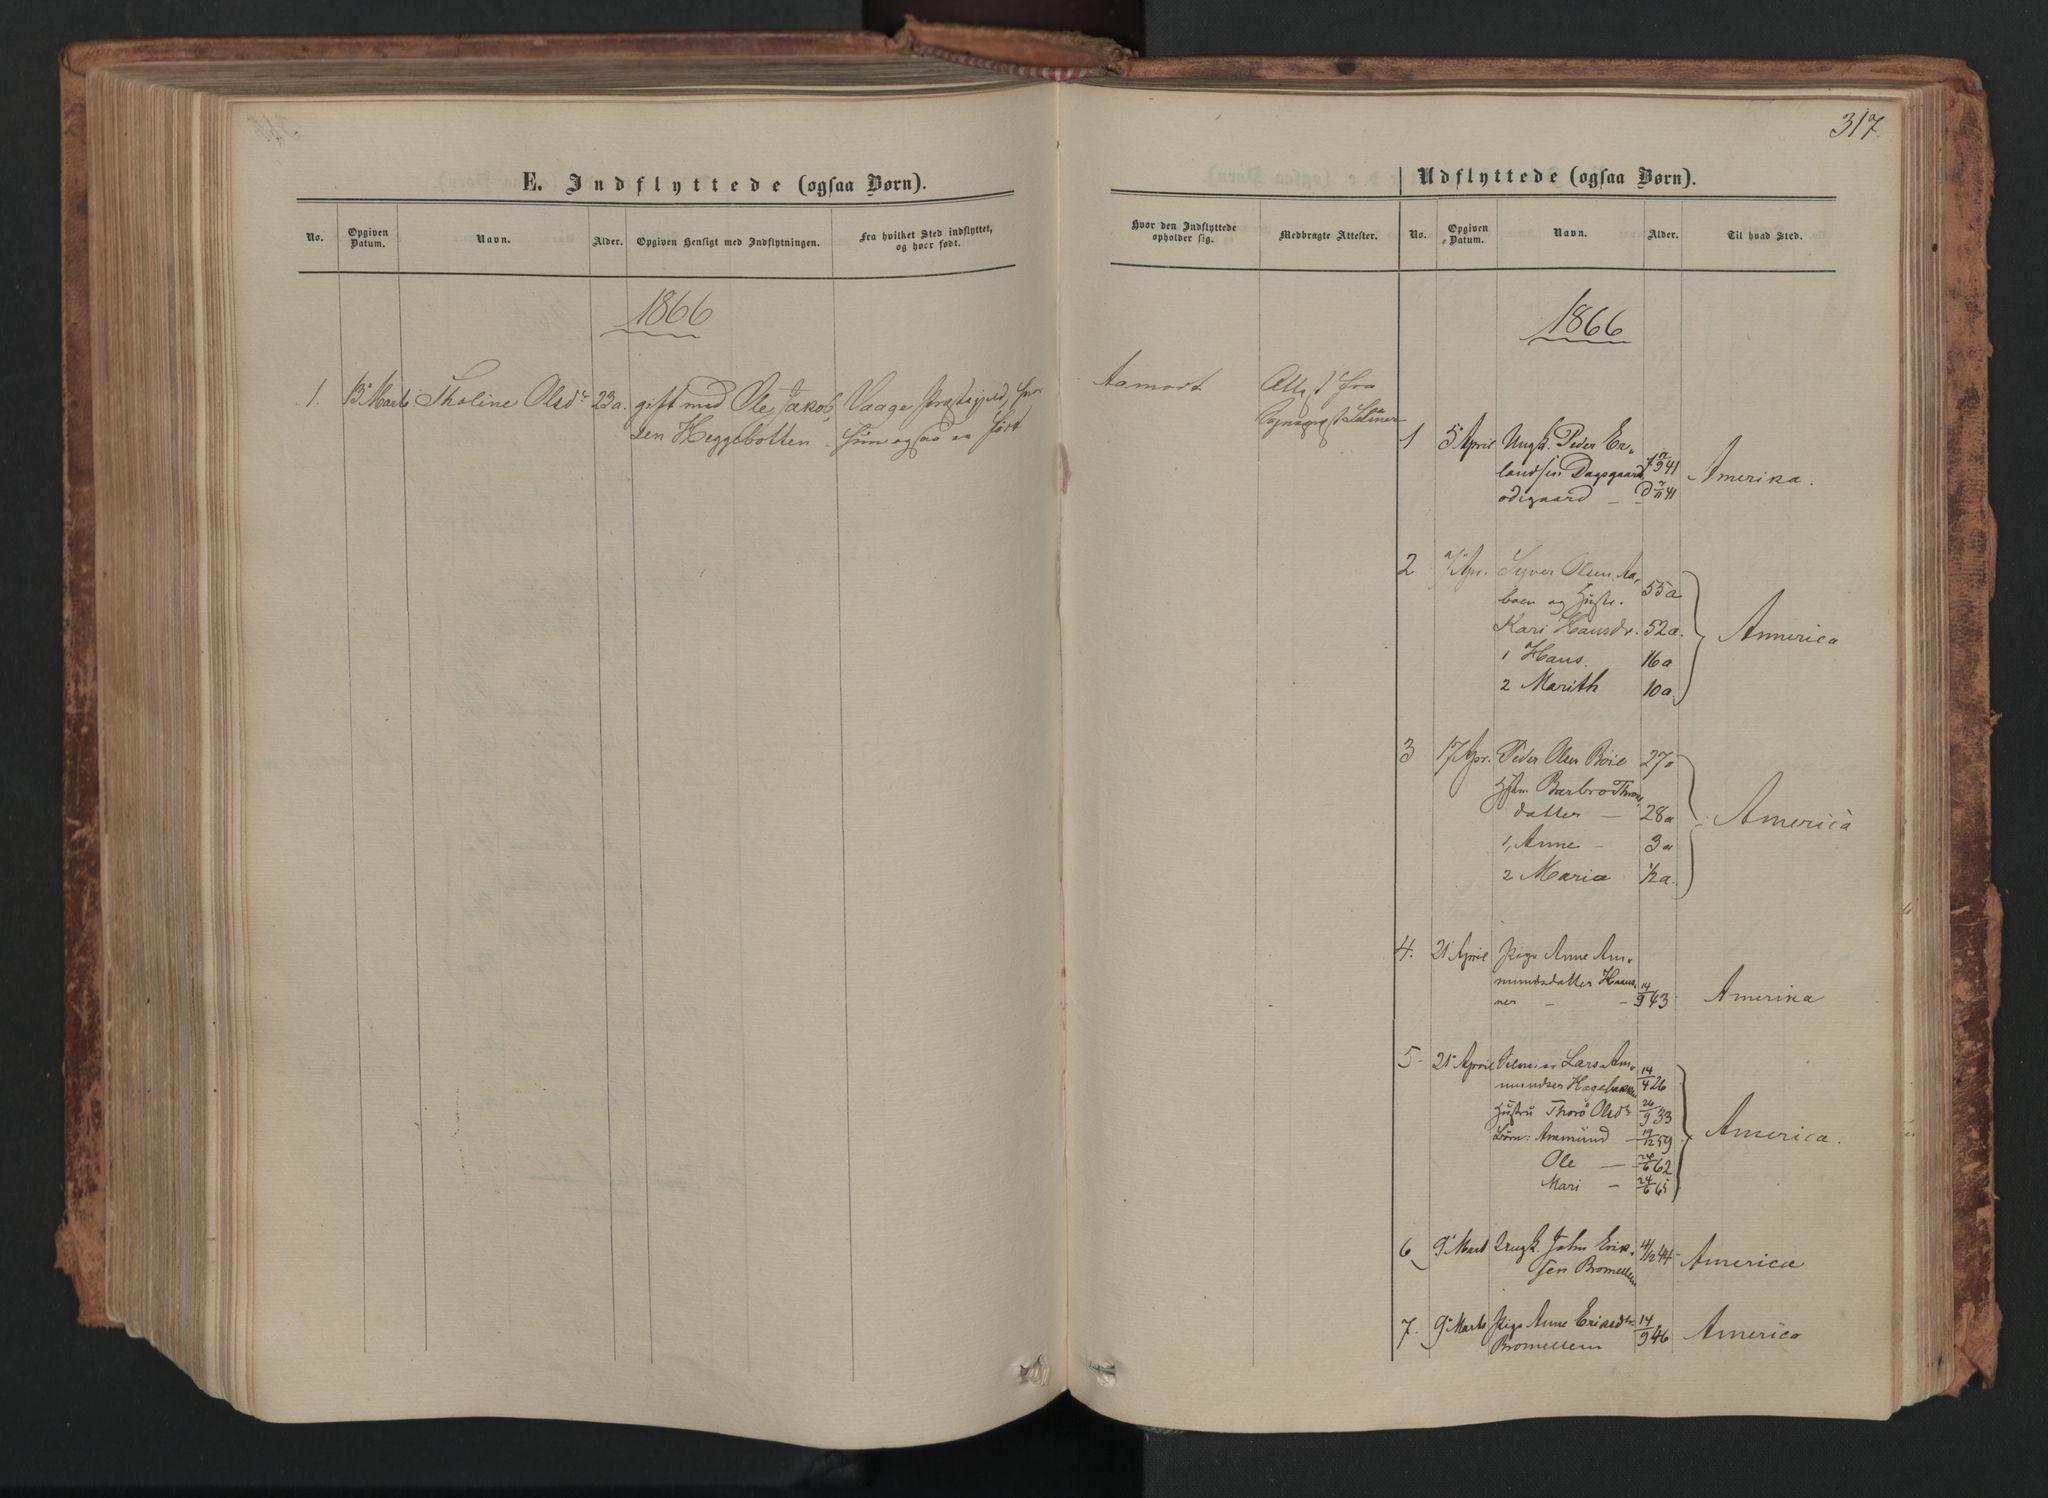 SAH, Skjåk prestekontor, Ministerialbok nr. 1, 1863-1879, s. 317